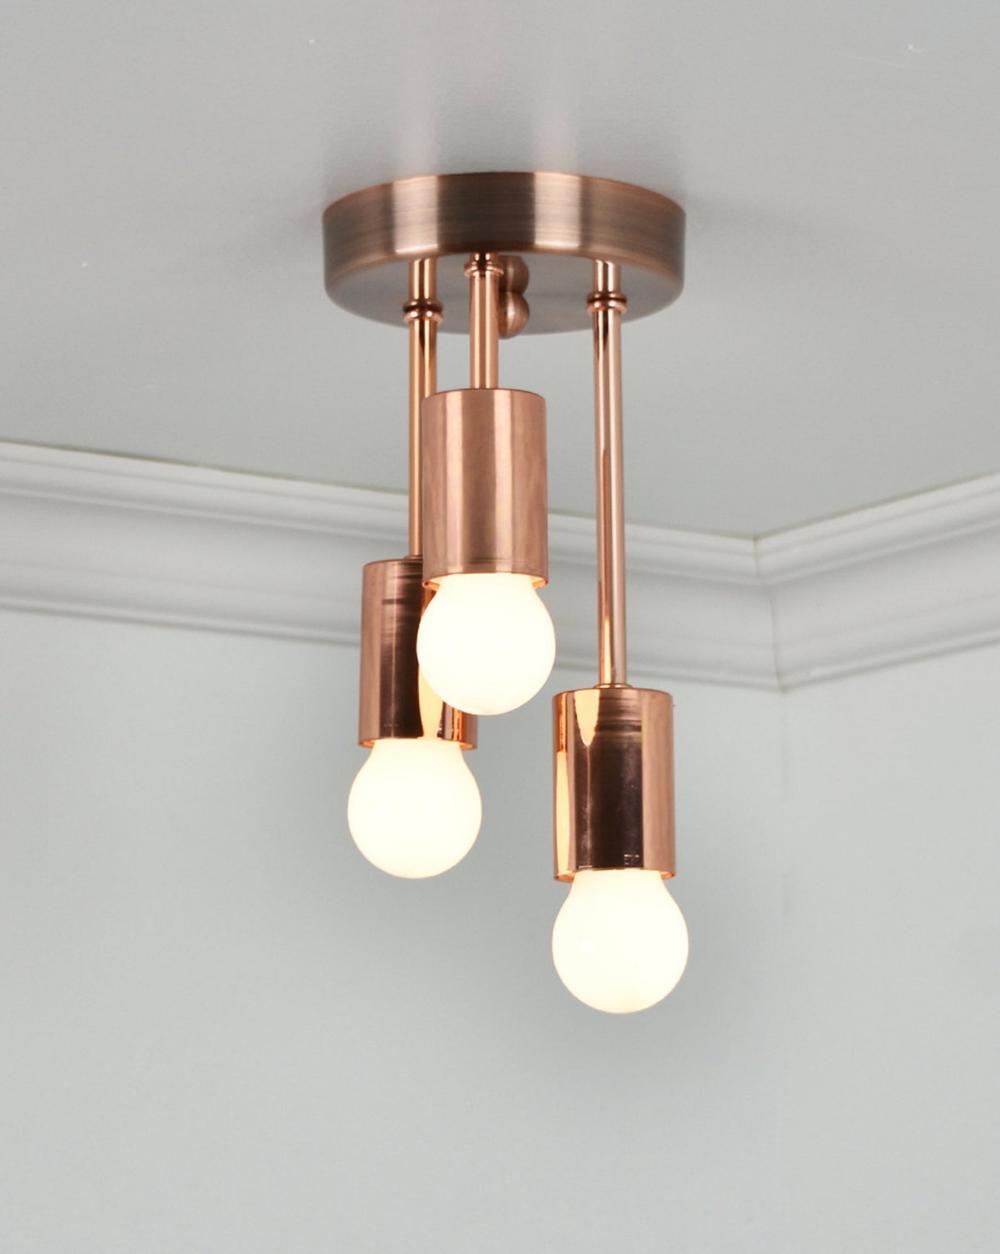 Copper Ceiling Light Triple Flush Mount Three Bulb Ceiling Etsy In 2020 Copper Ceiling Lights Brass Ceiling Light Light Fixtures Flush Mount